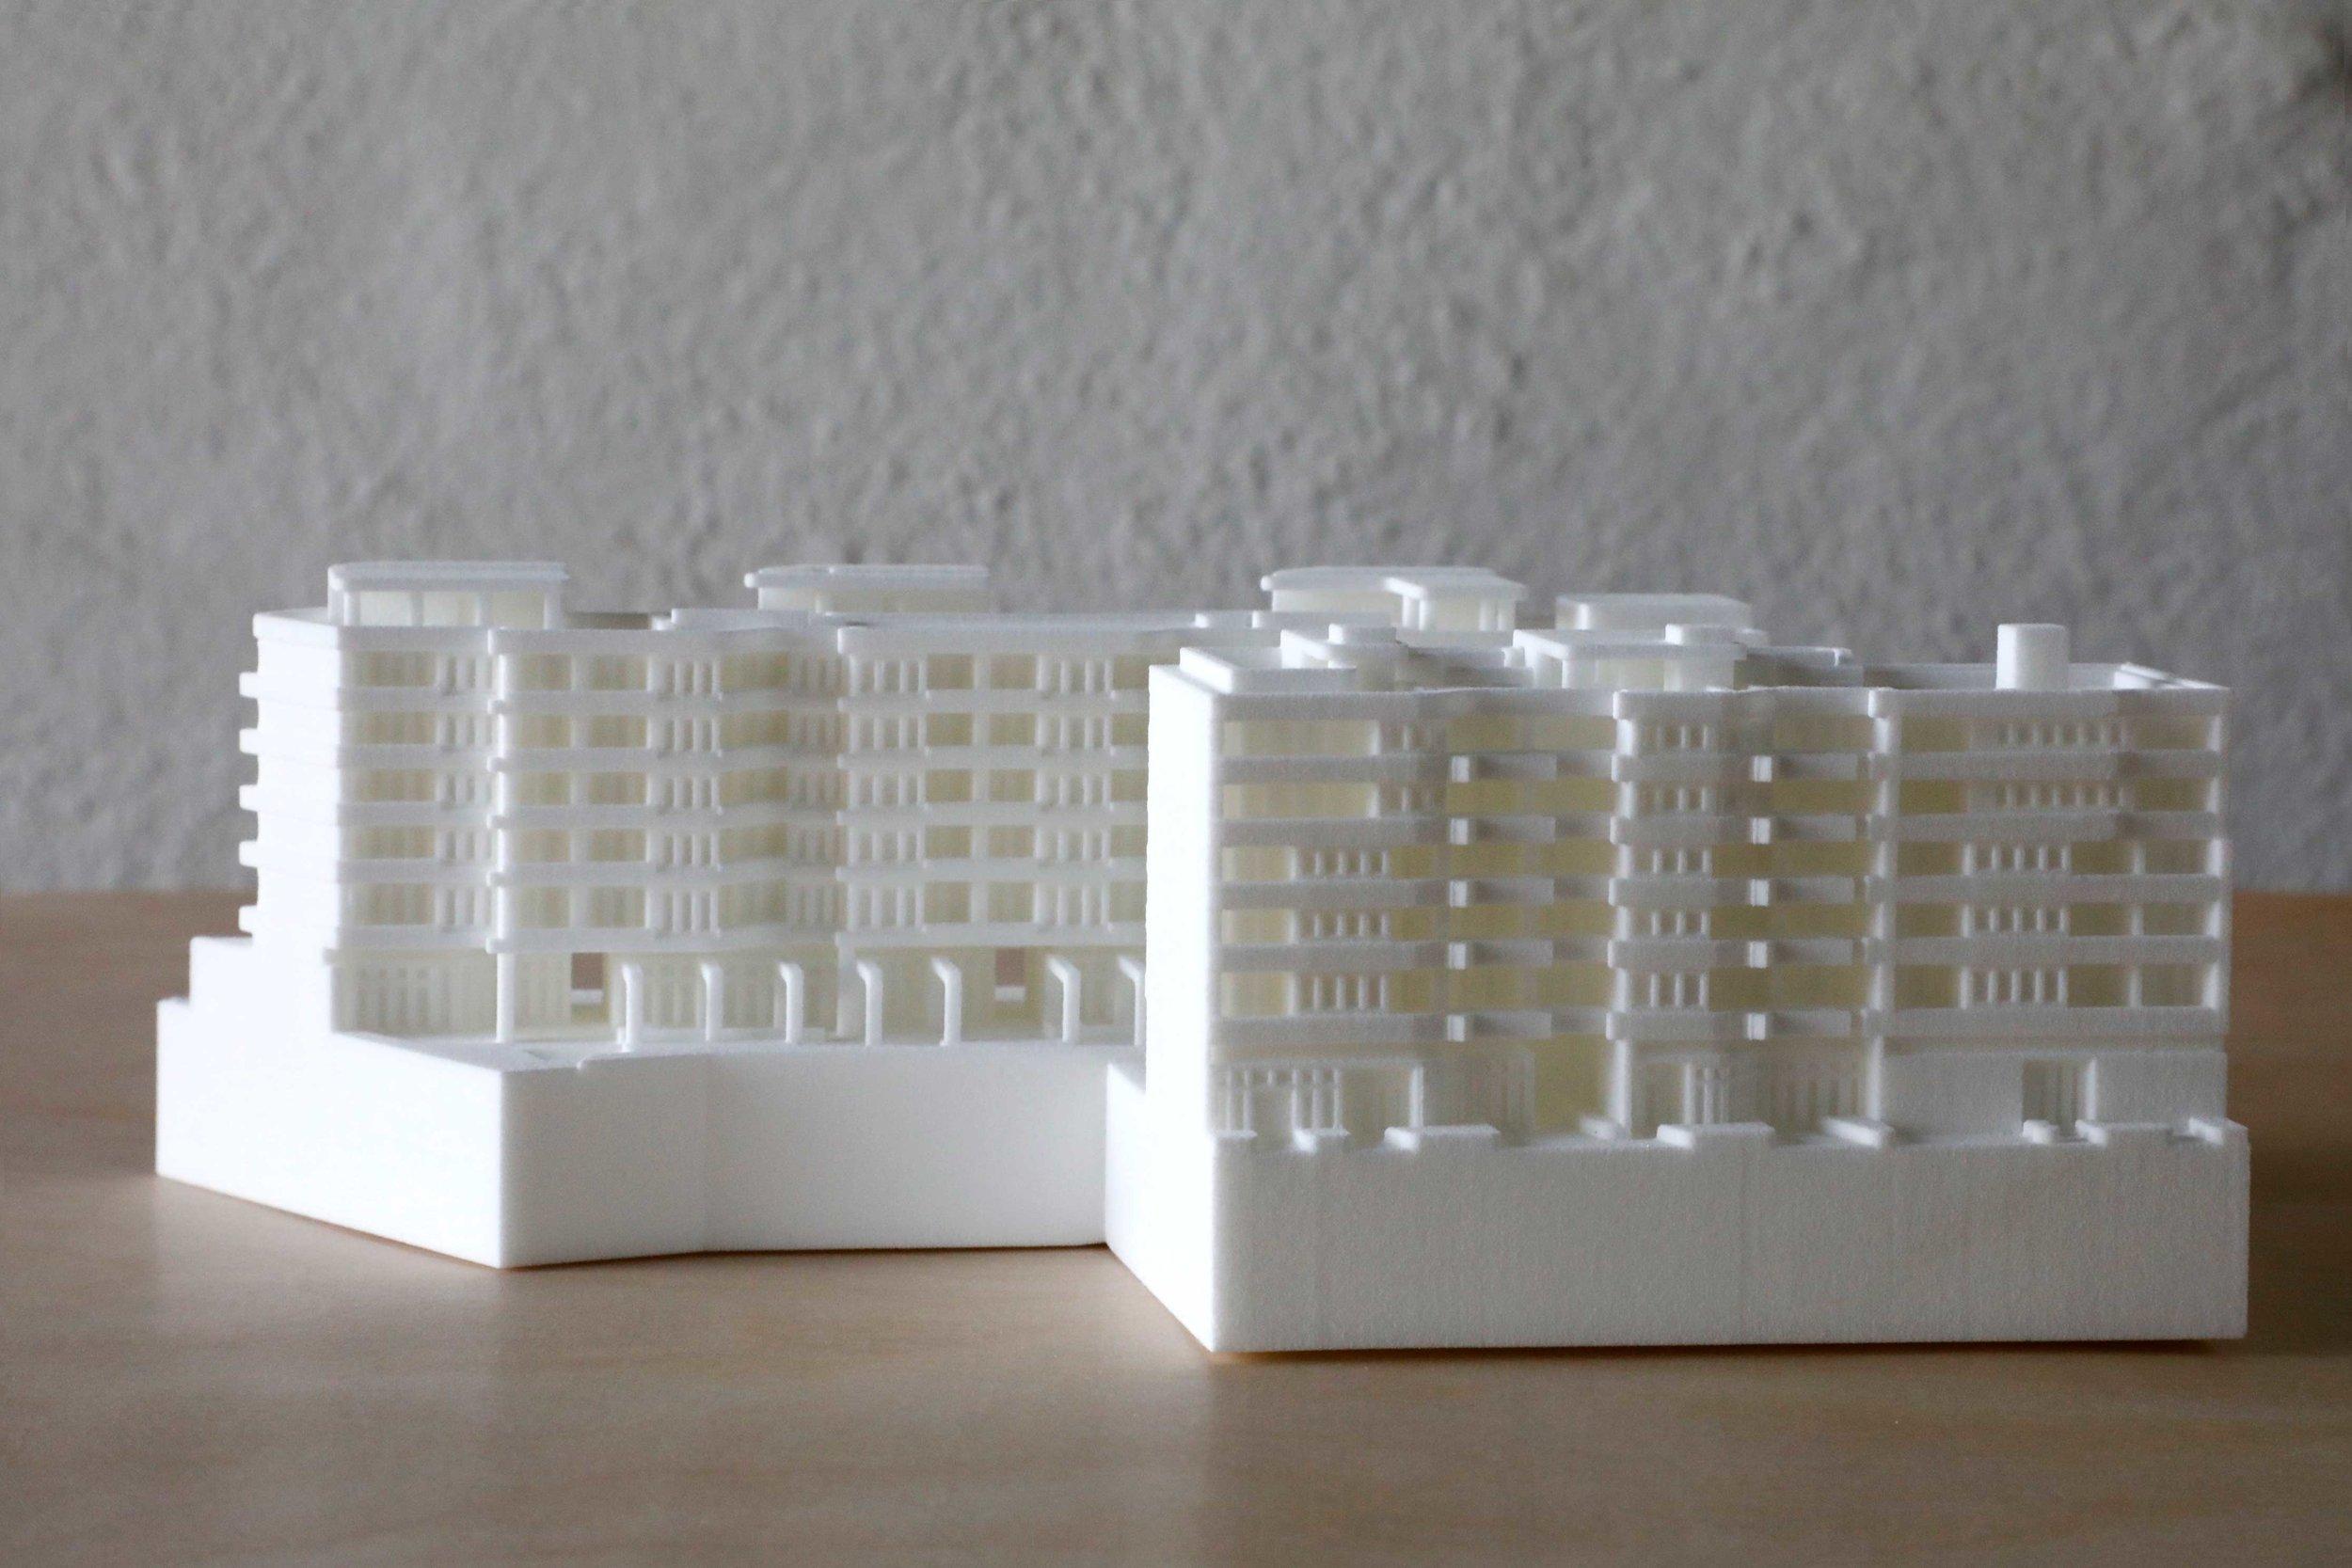 DA_Model_Sydney_Make_Models_Architecture_3d_print - Copy.jpg